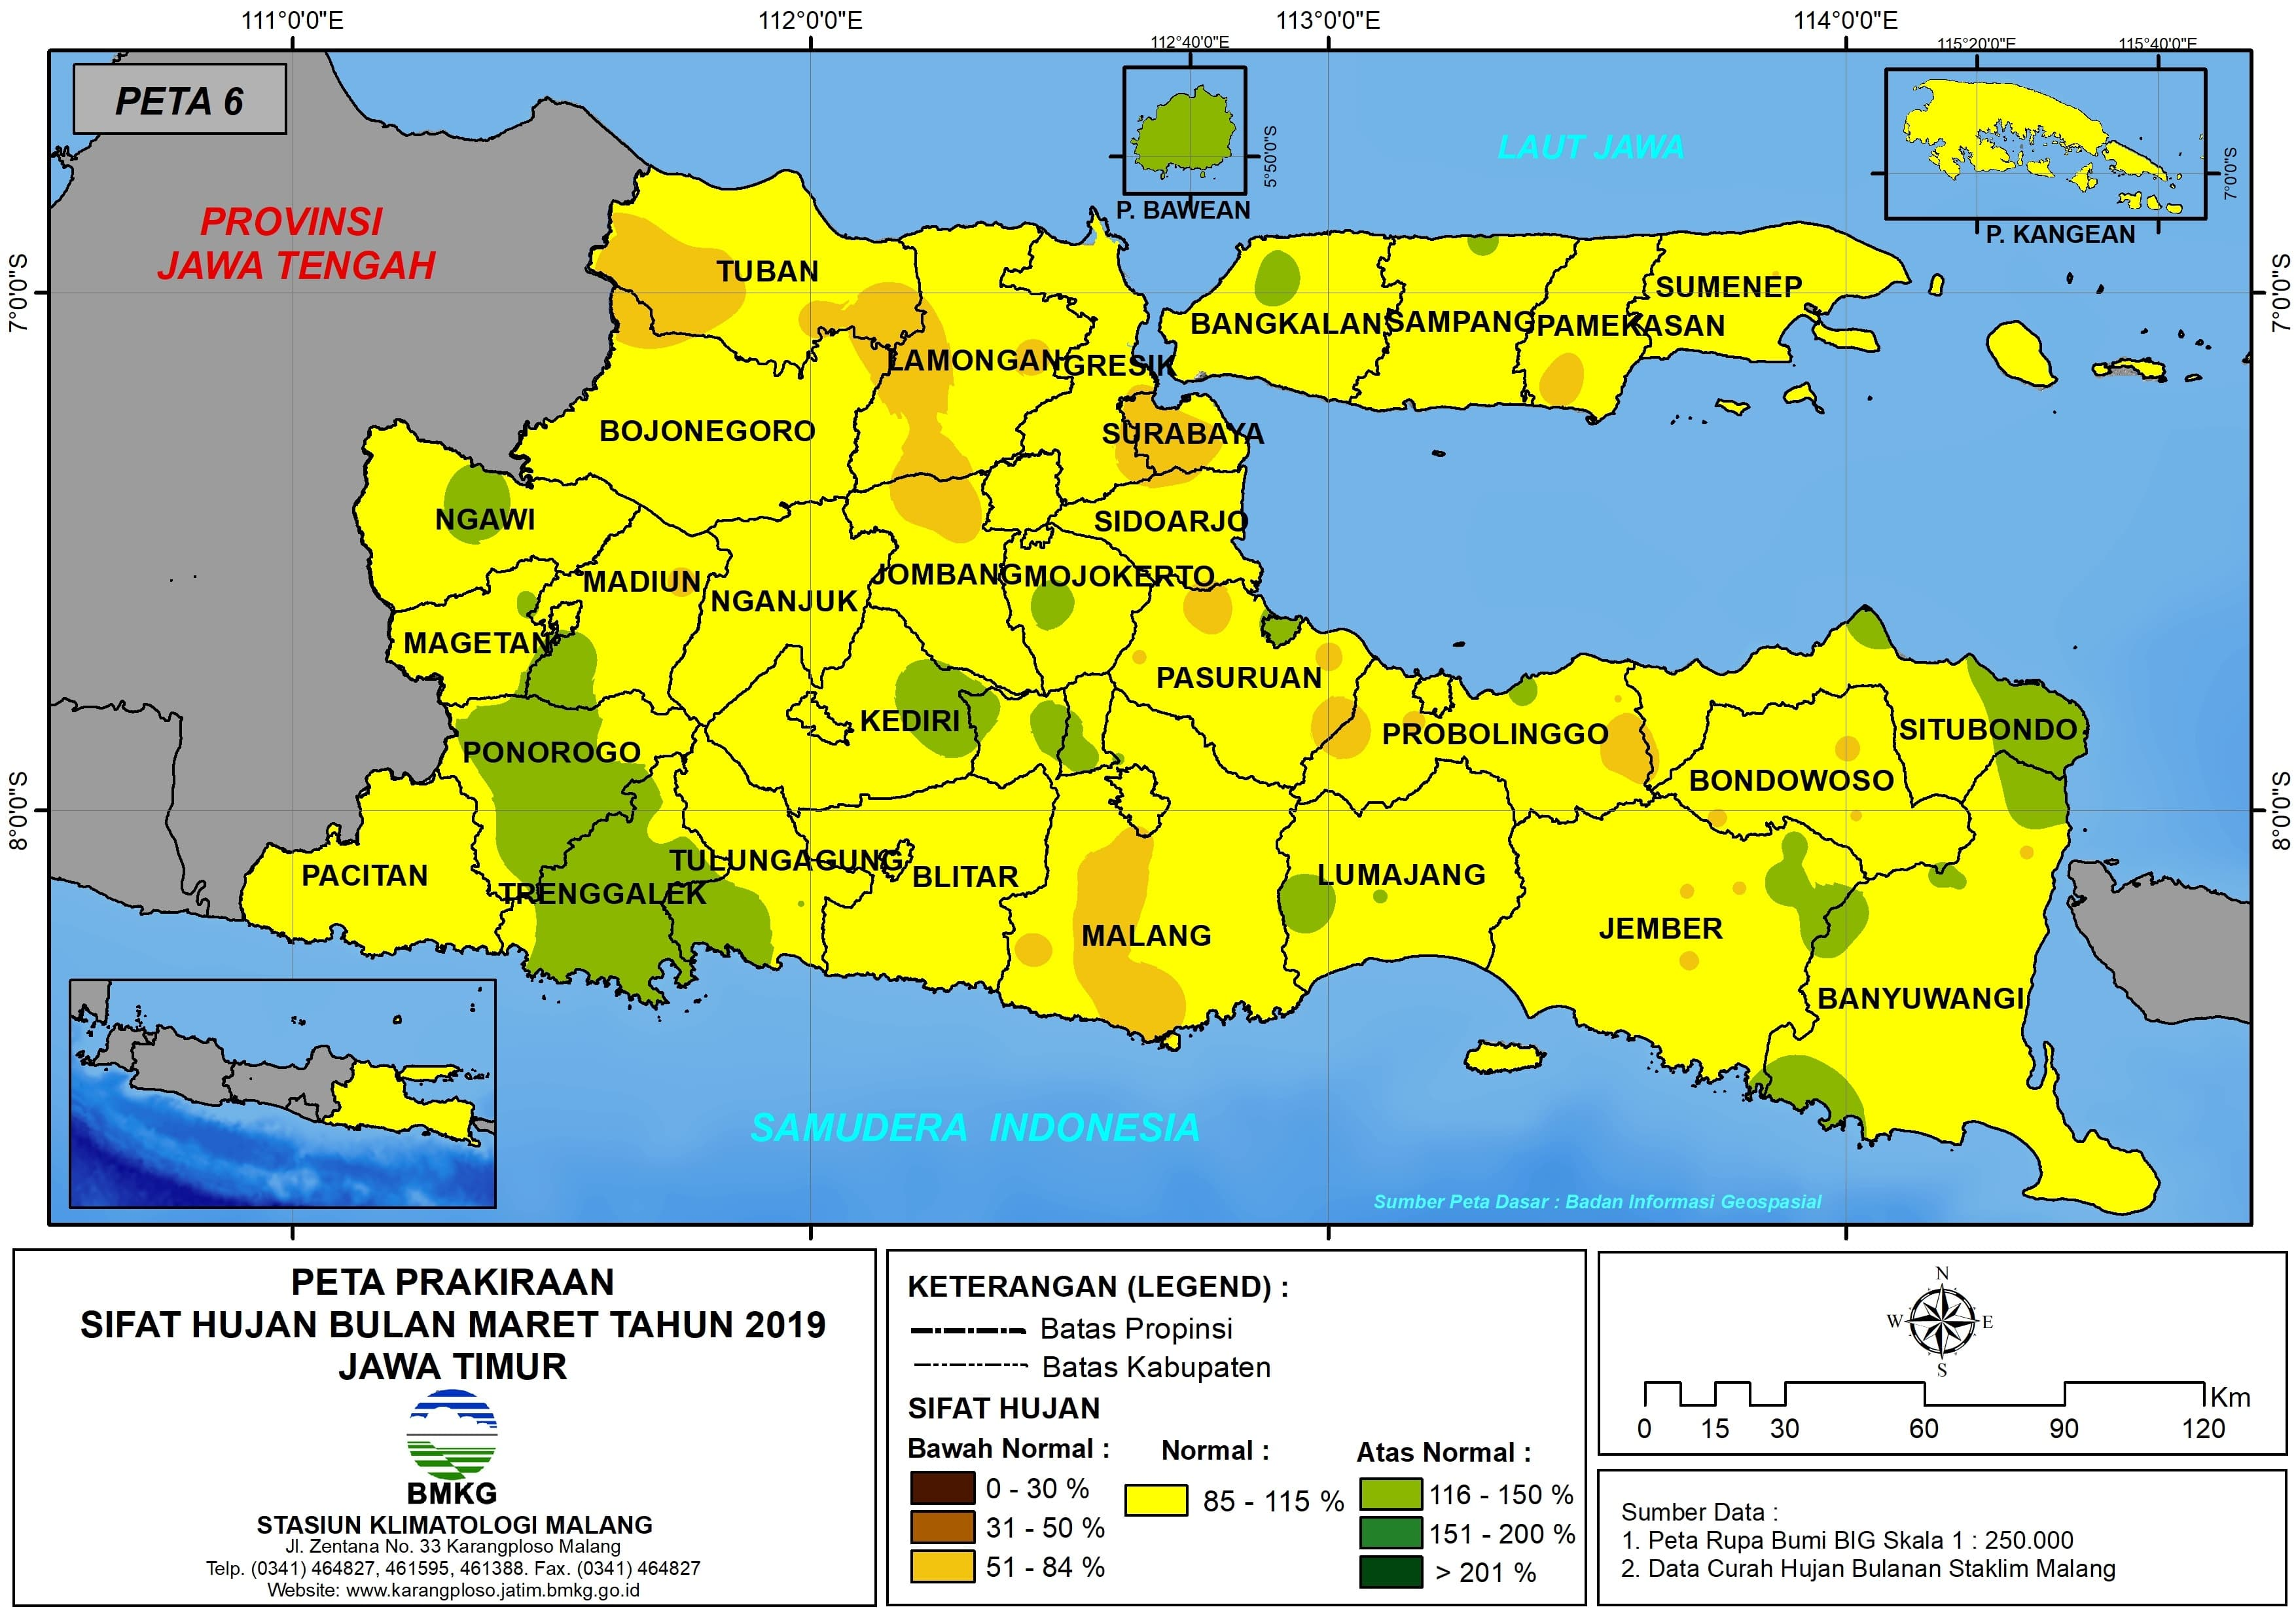 Prakiraan Sifat Hujan Bulan Maret Tahun 2018 di Provinsi Jawa Timur Update dari Analisis Bulan Desember 2018